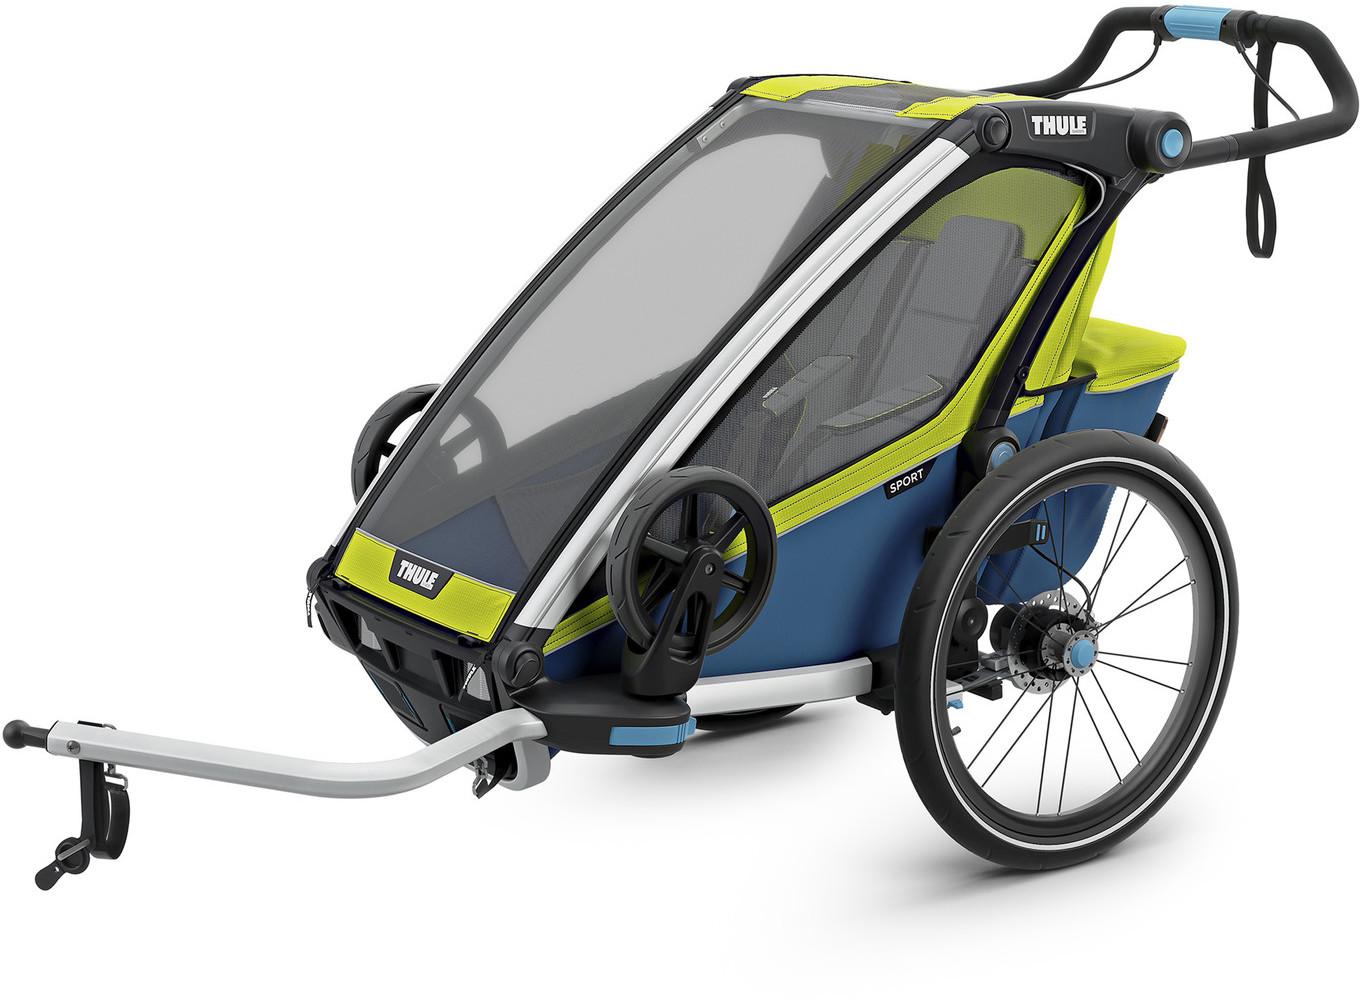 Thule Chariot Sport1 2019 zielony/niebieski TH/10201014